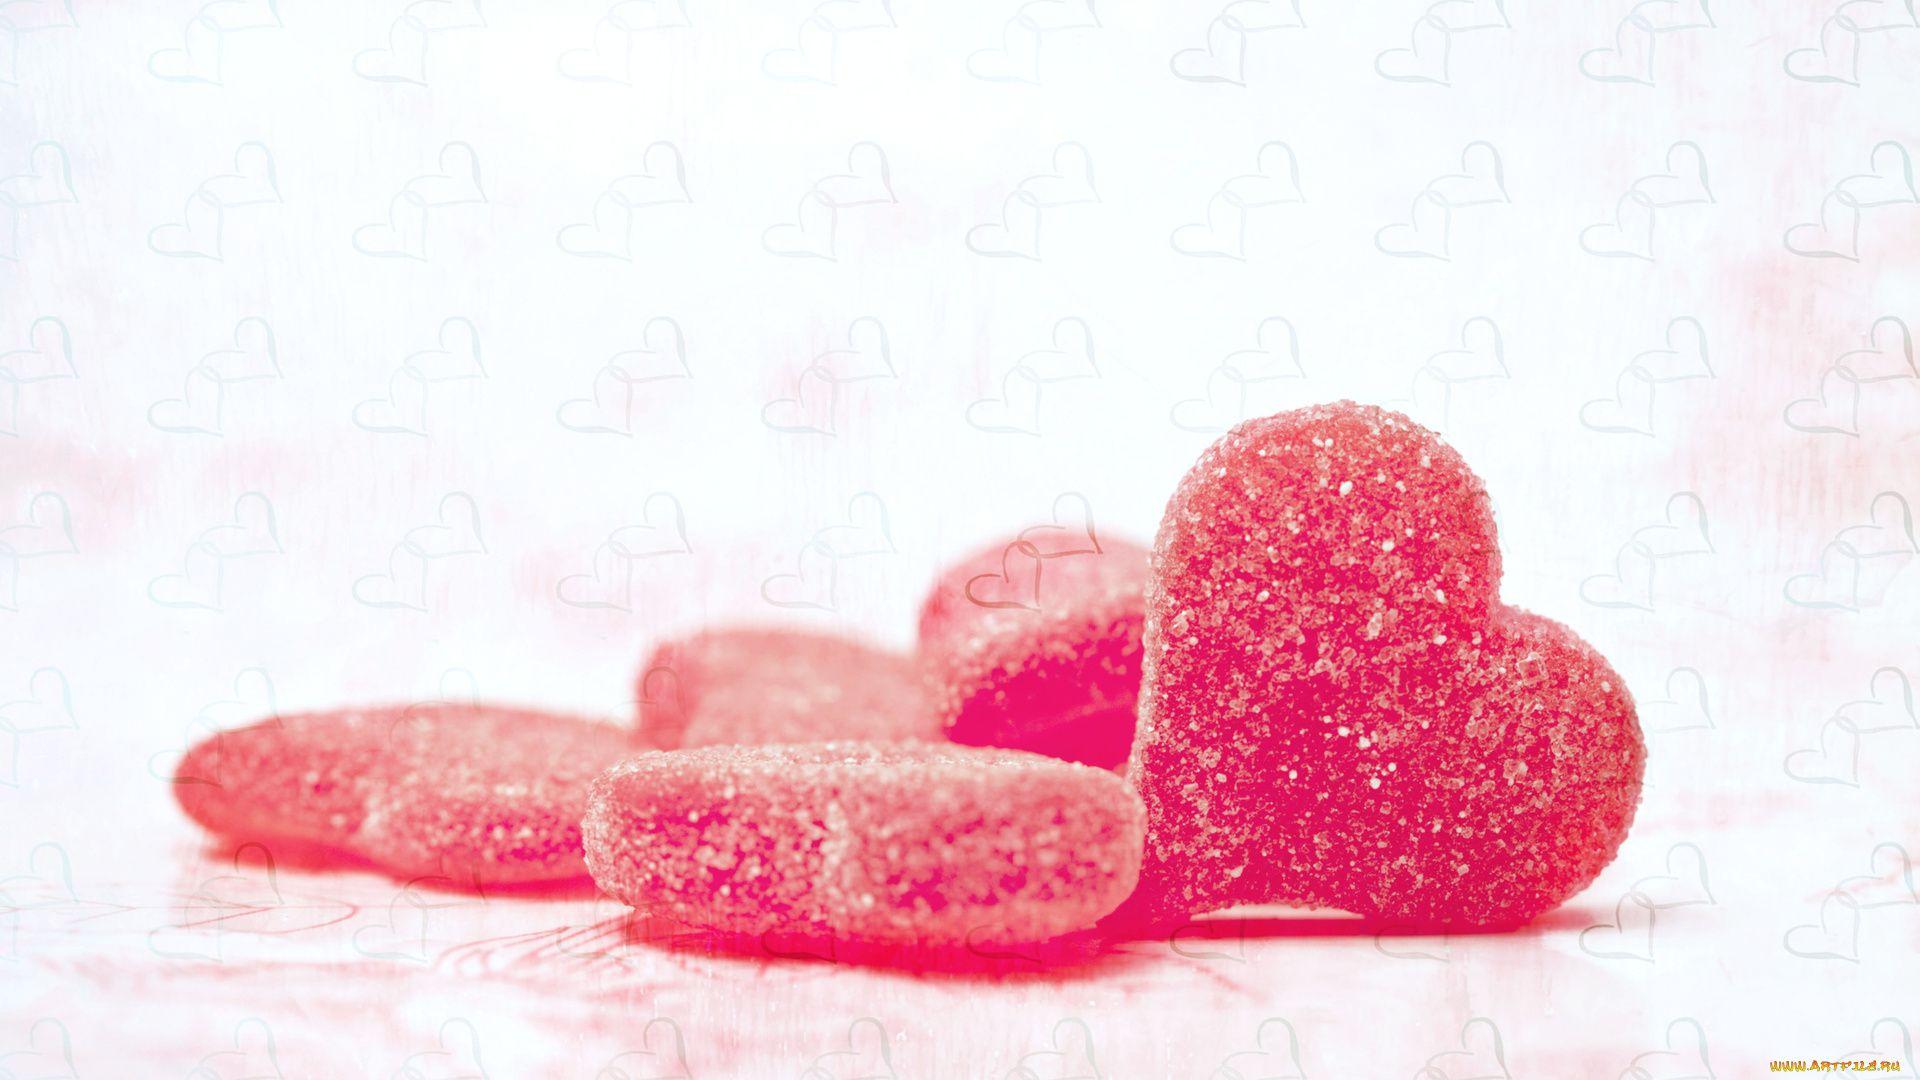 Sugar wallpaper image hd